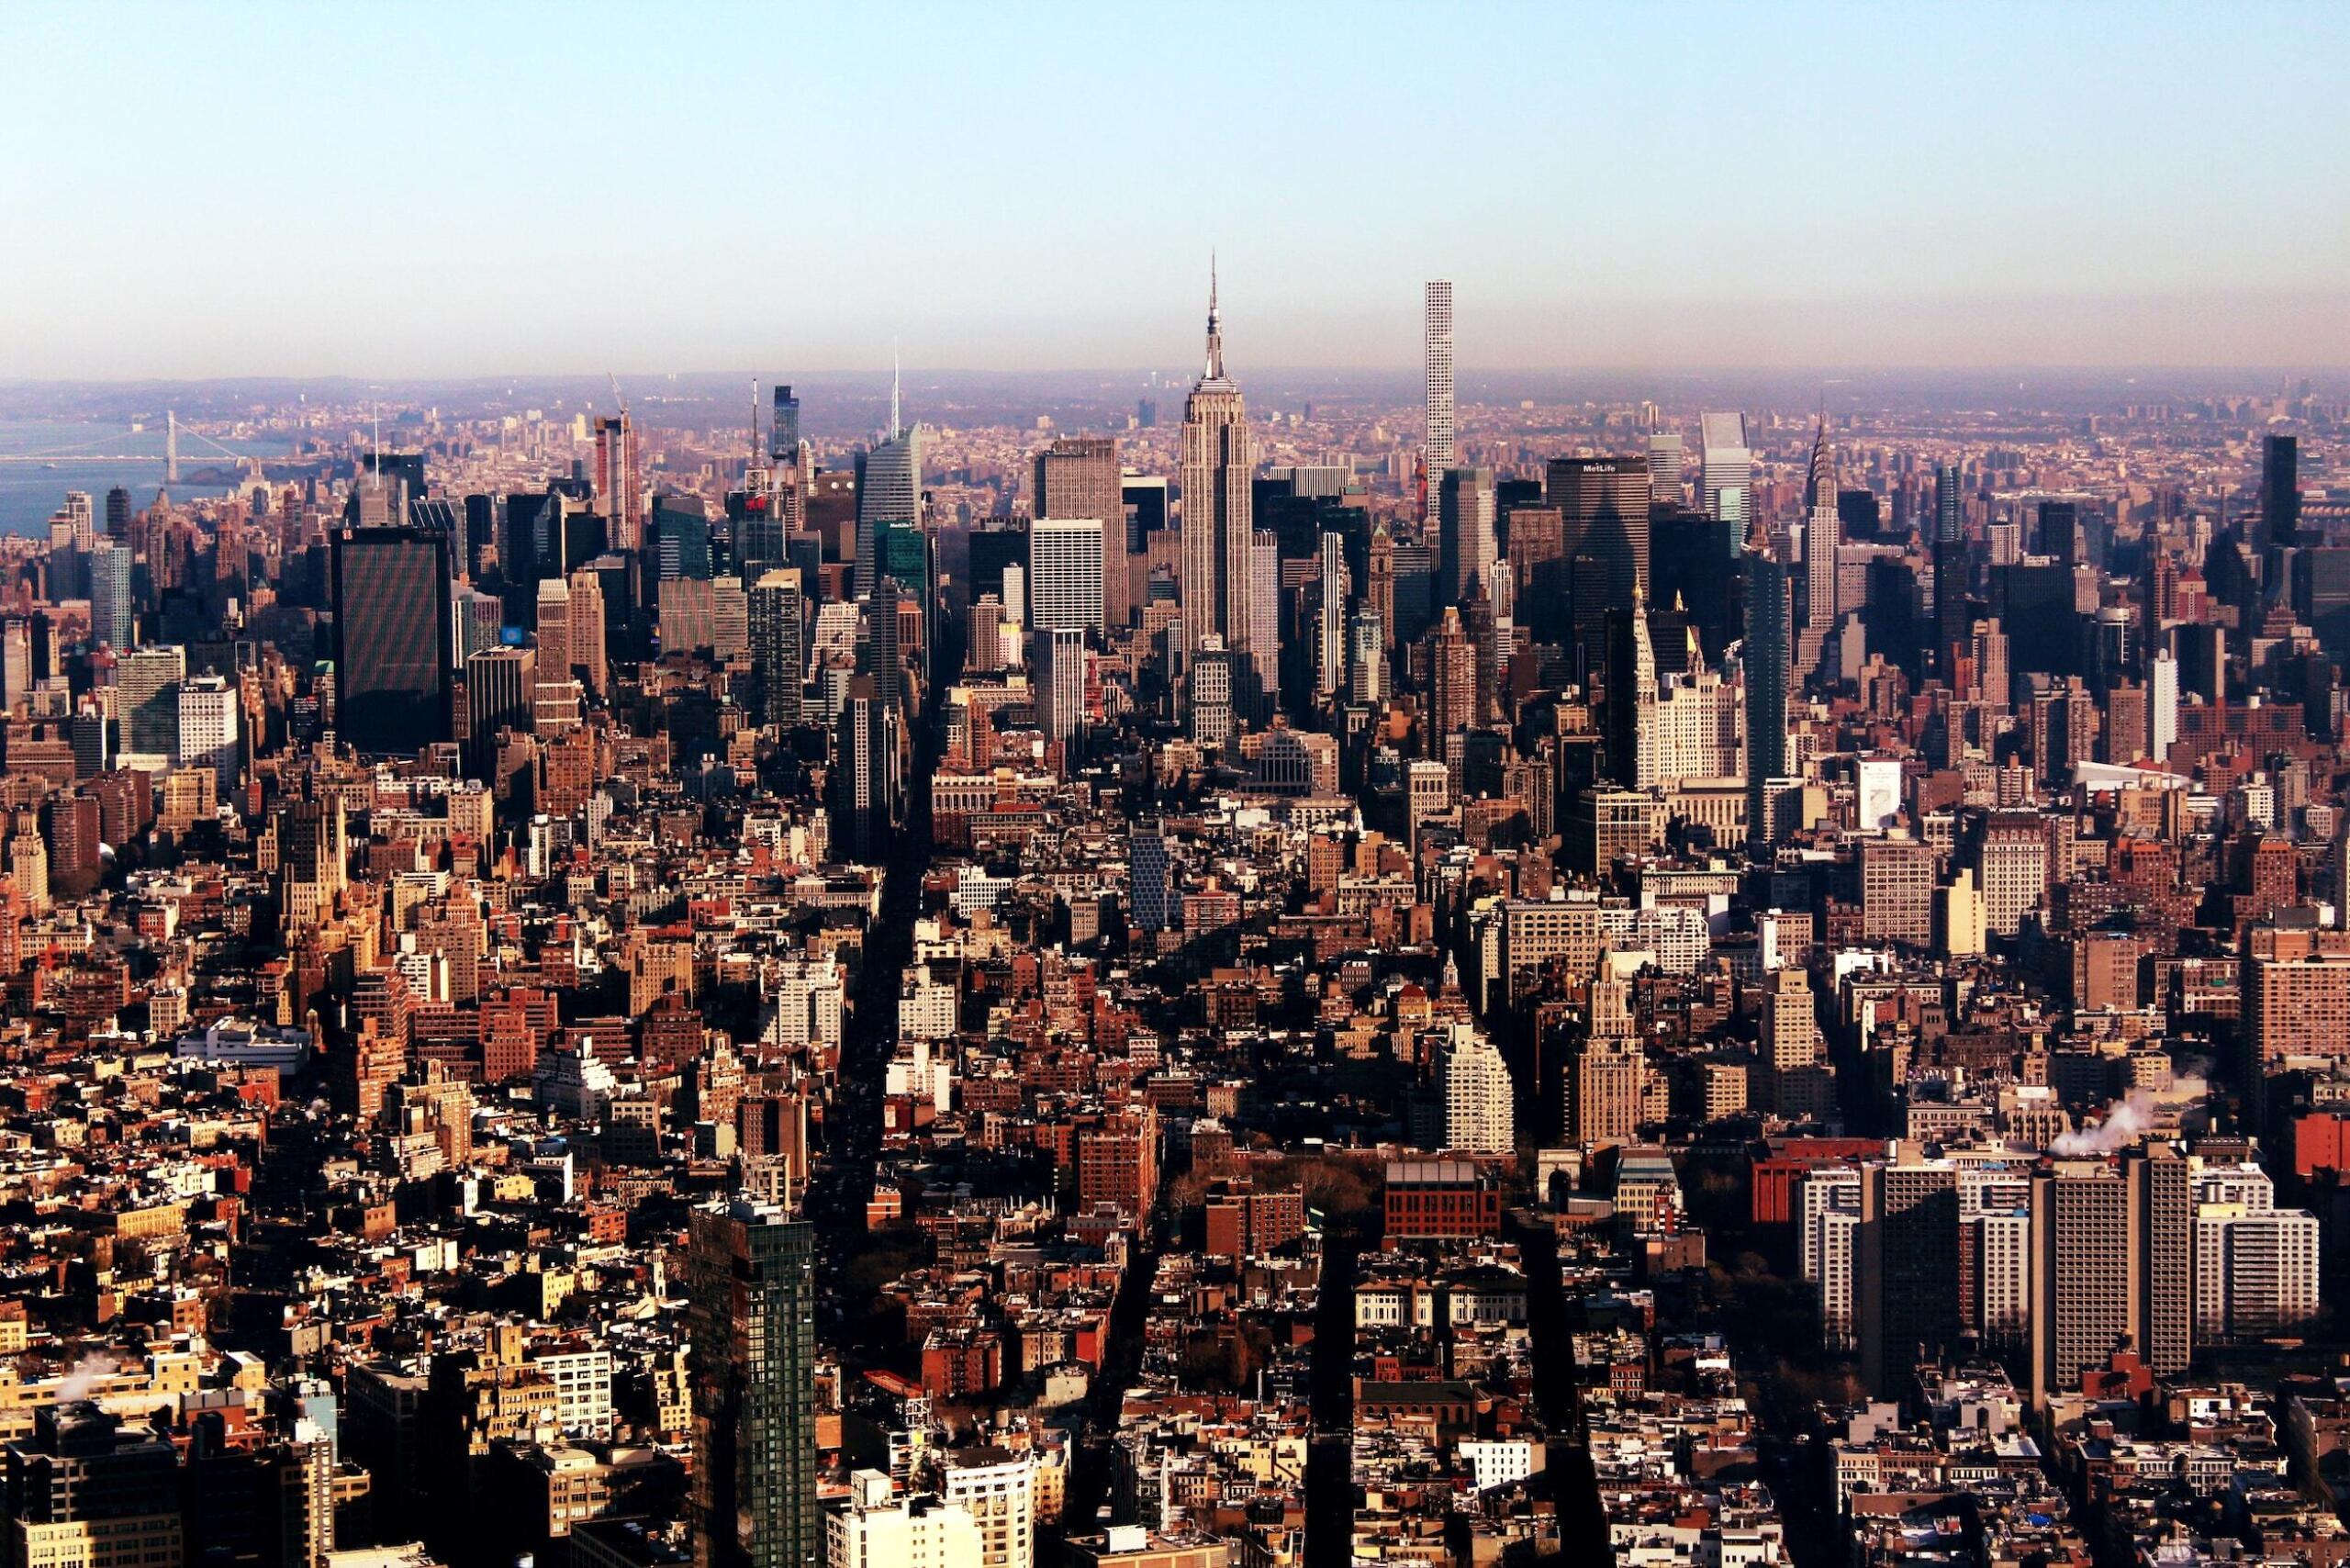 Wide aerial shot of Manhattan, New York City